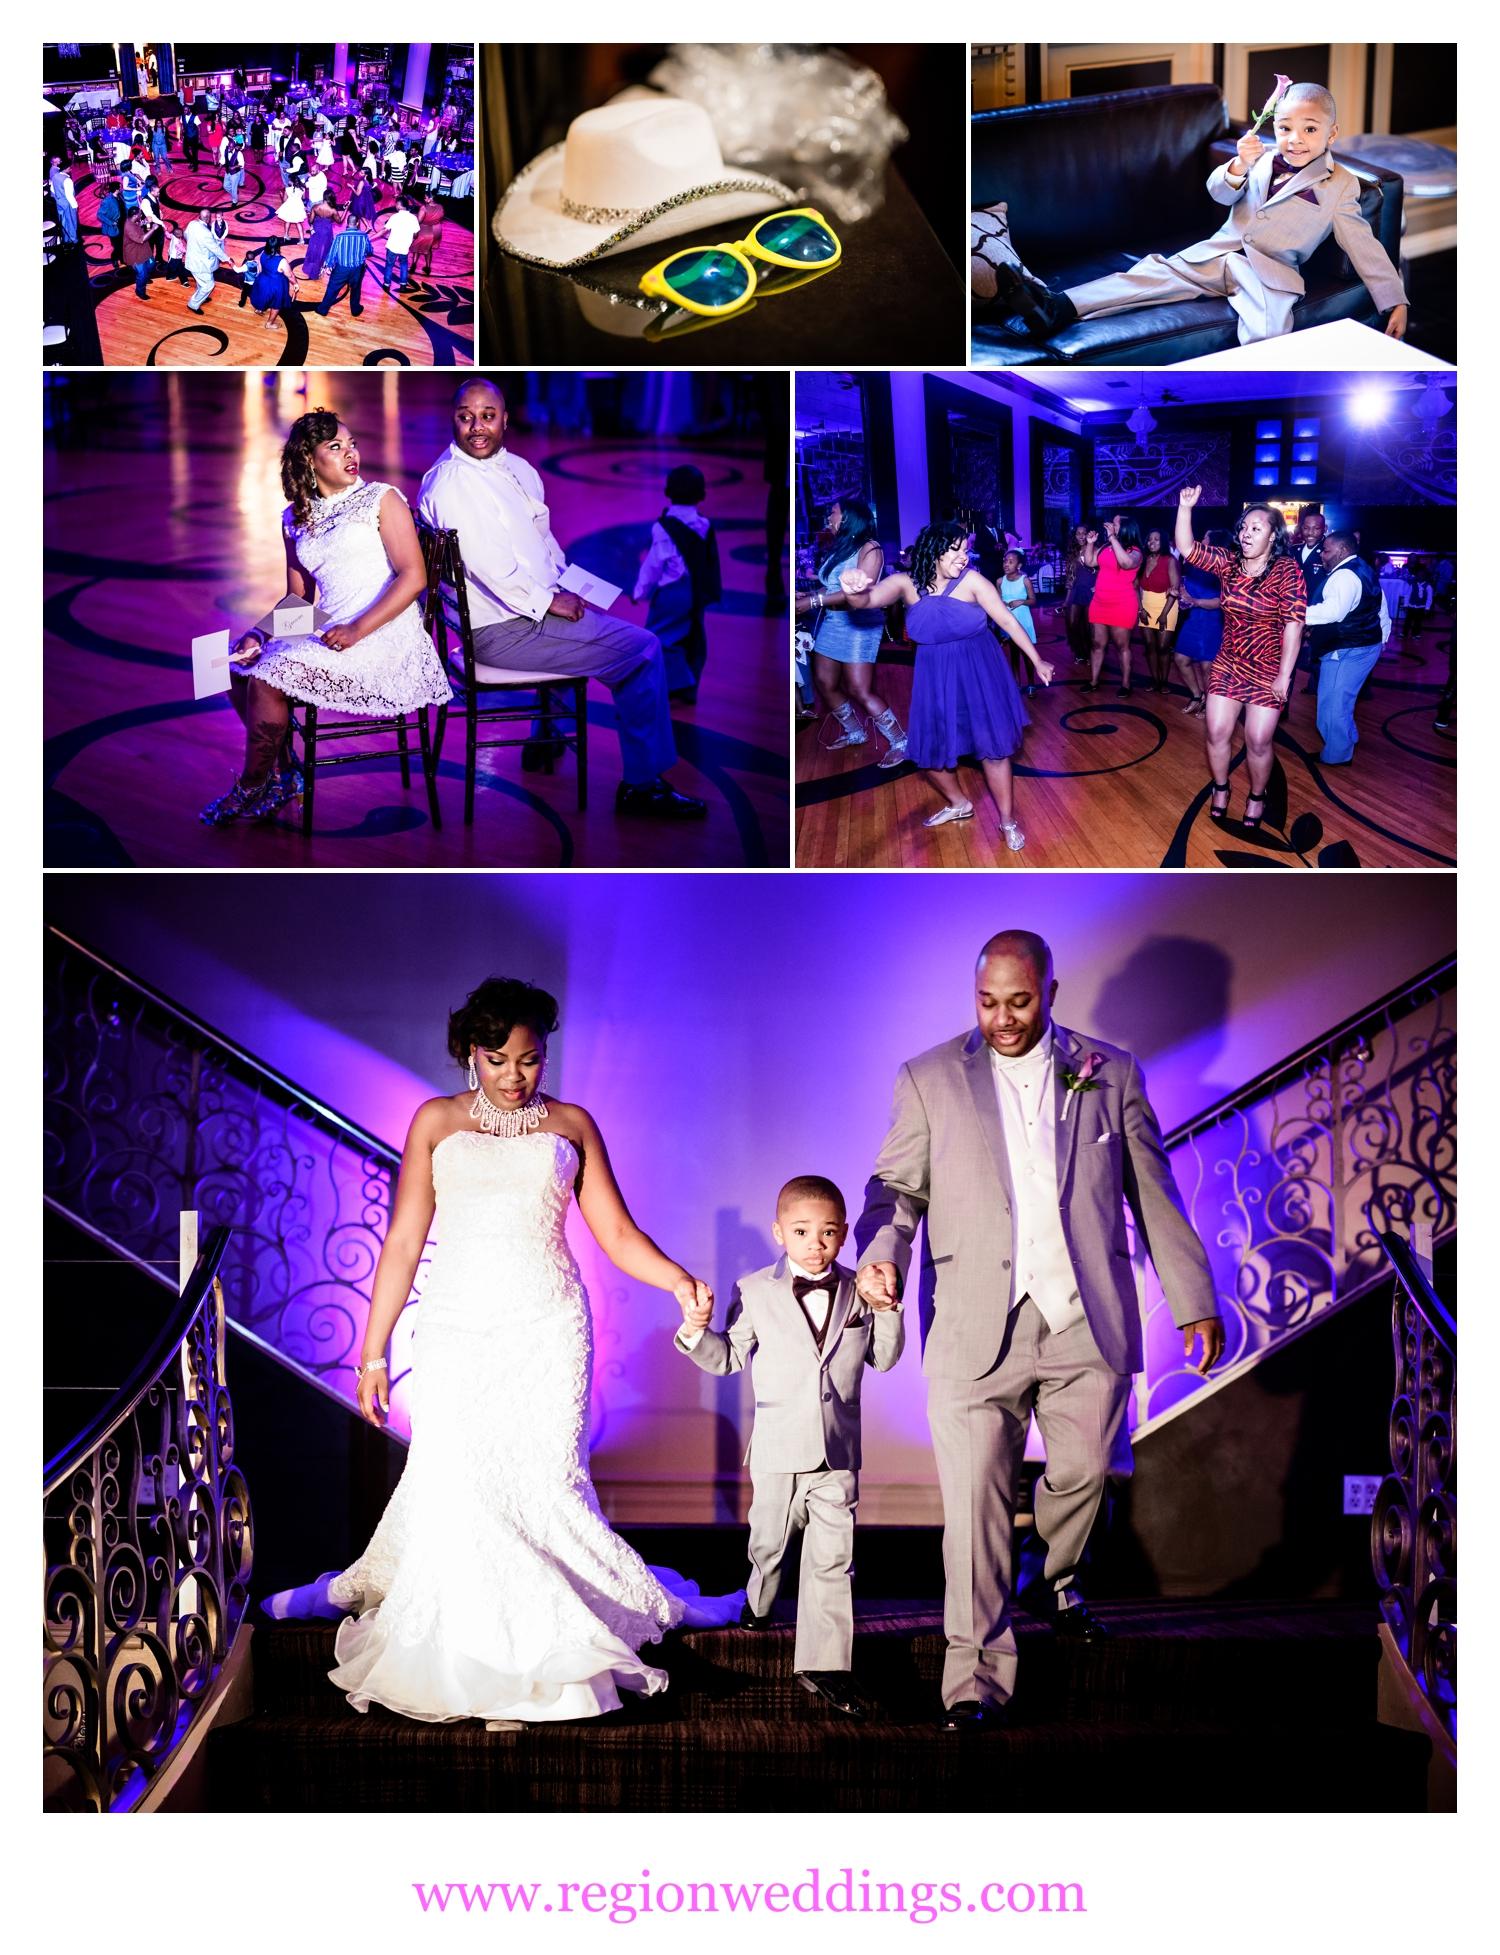 reception-photos-the-allure-ballroom.jpg